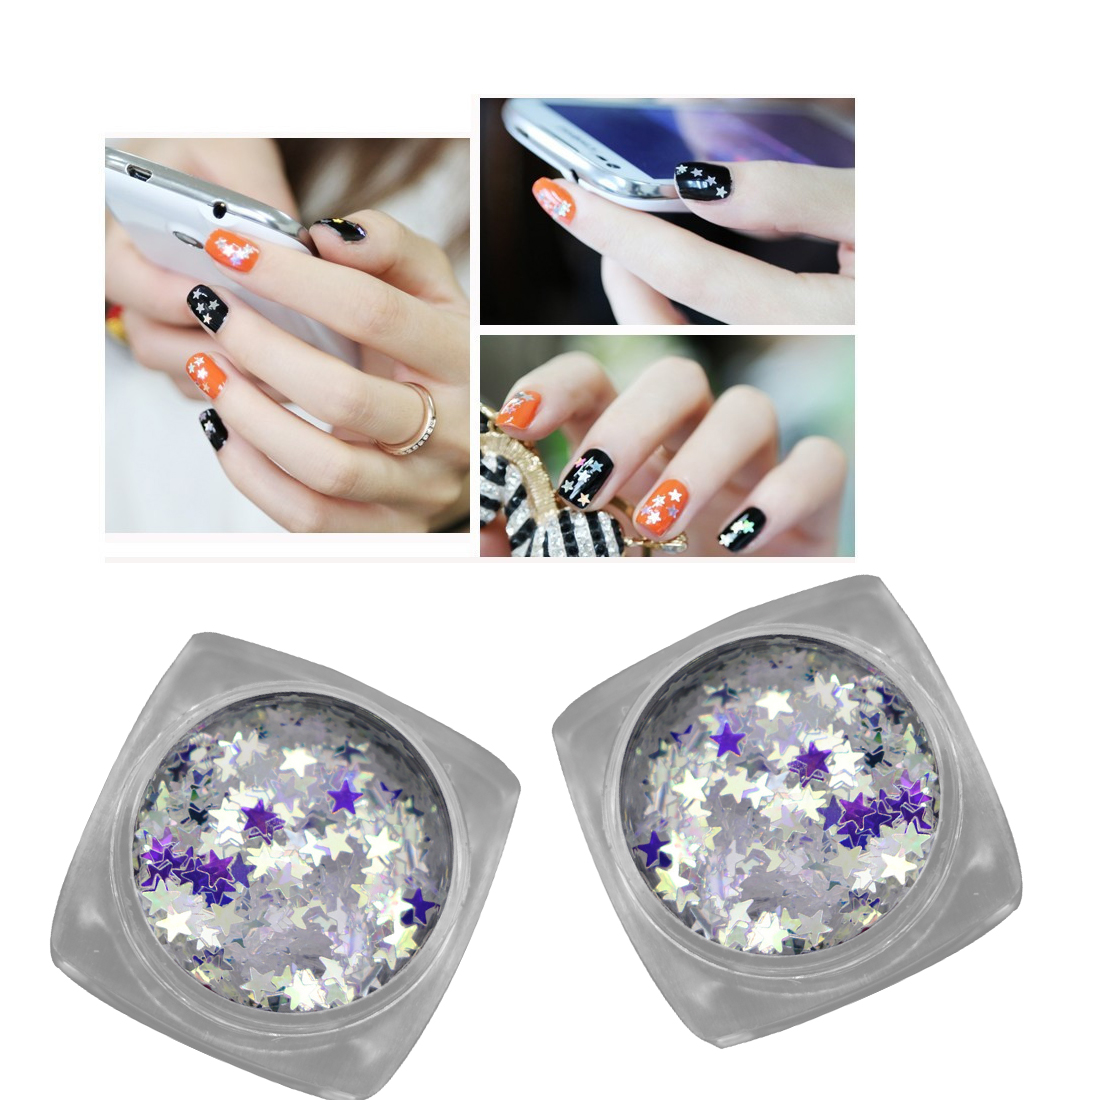 1 Flasche Nagel Glitter Laser Funkelnder Diamant Blau Shinning 3mm ...